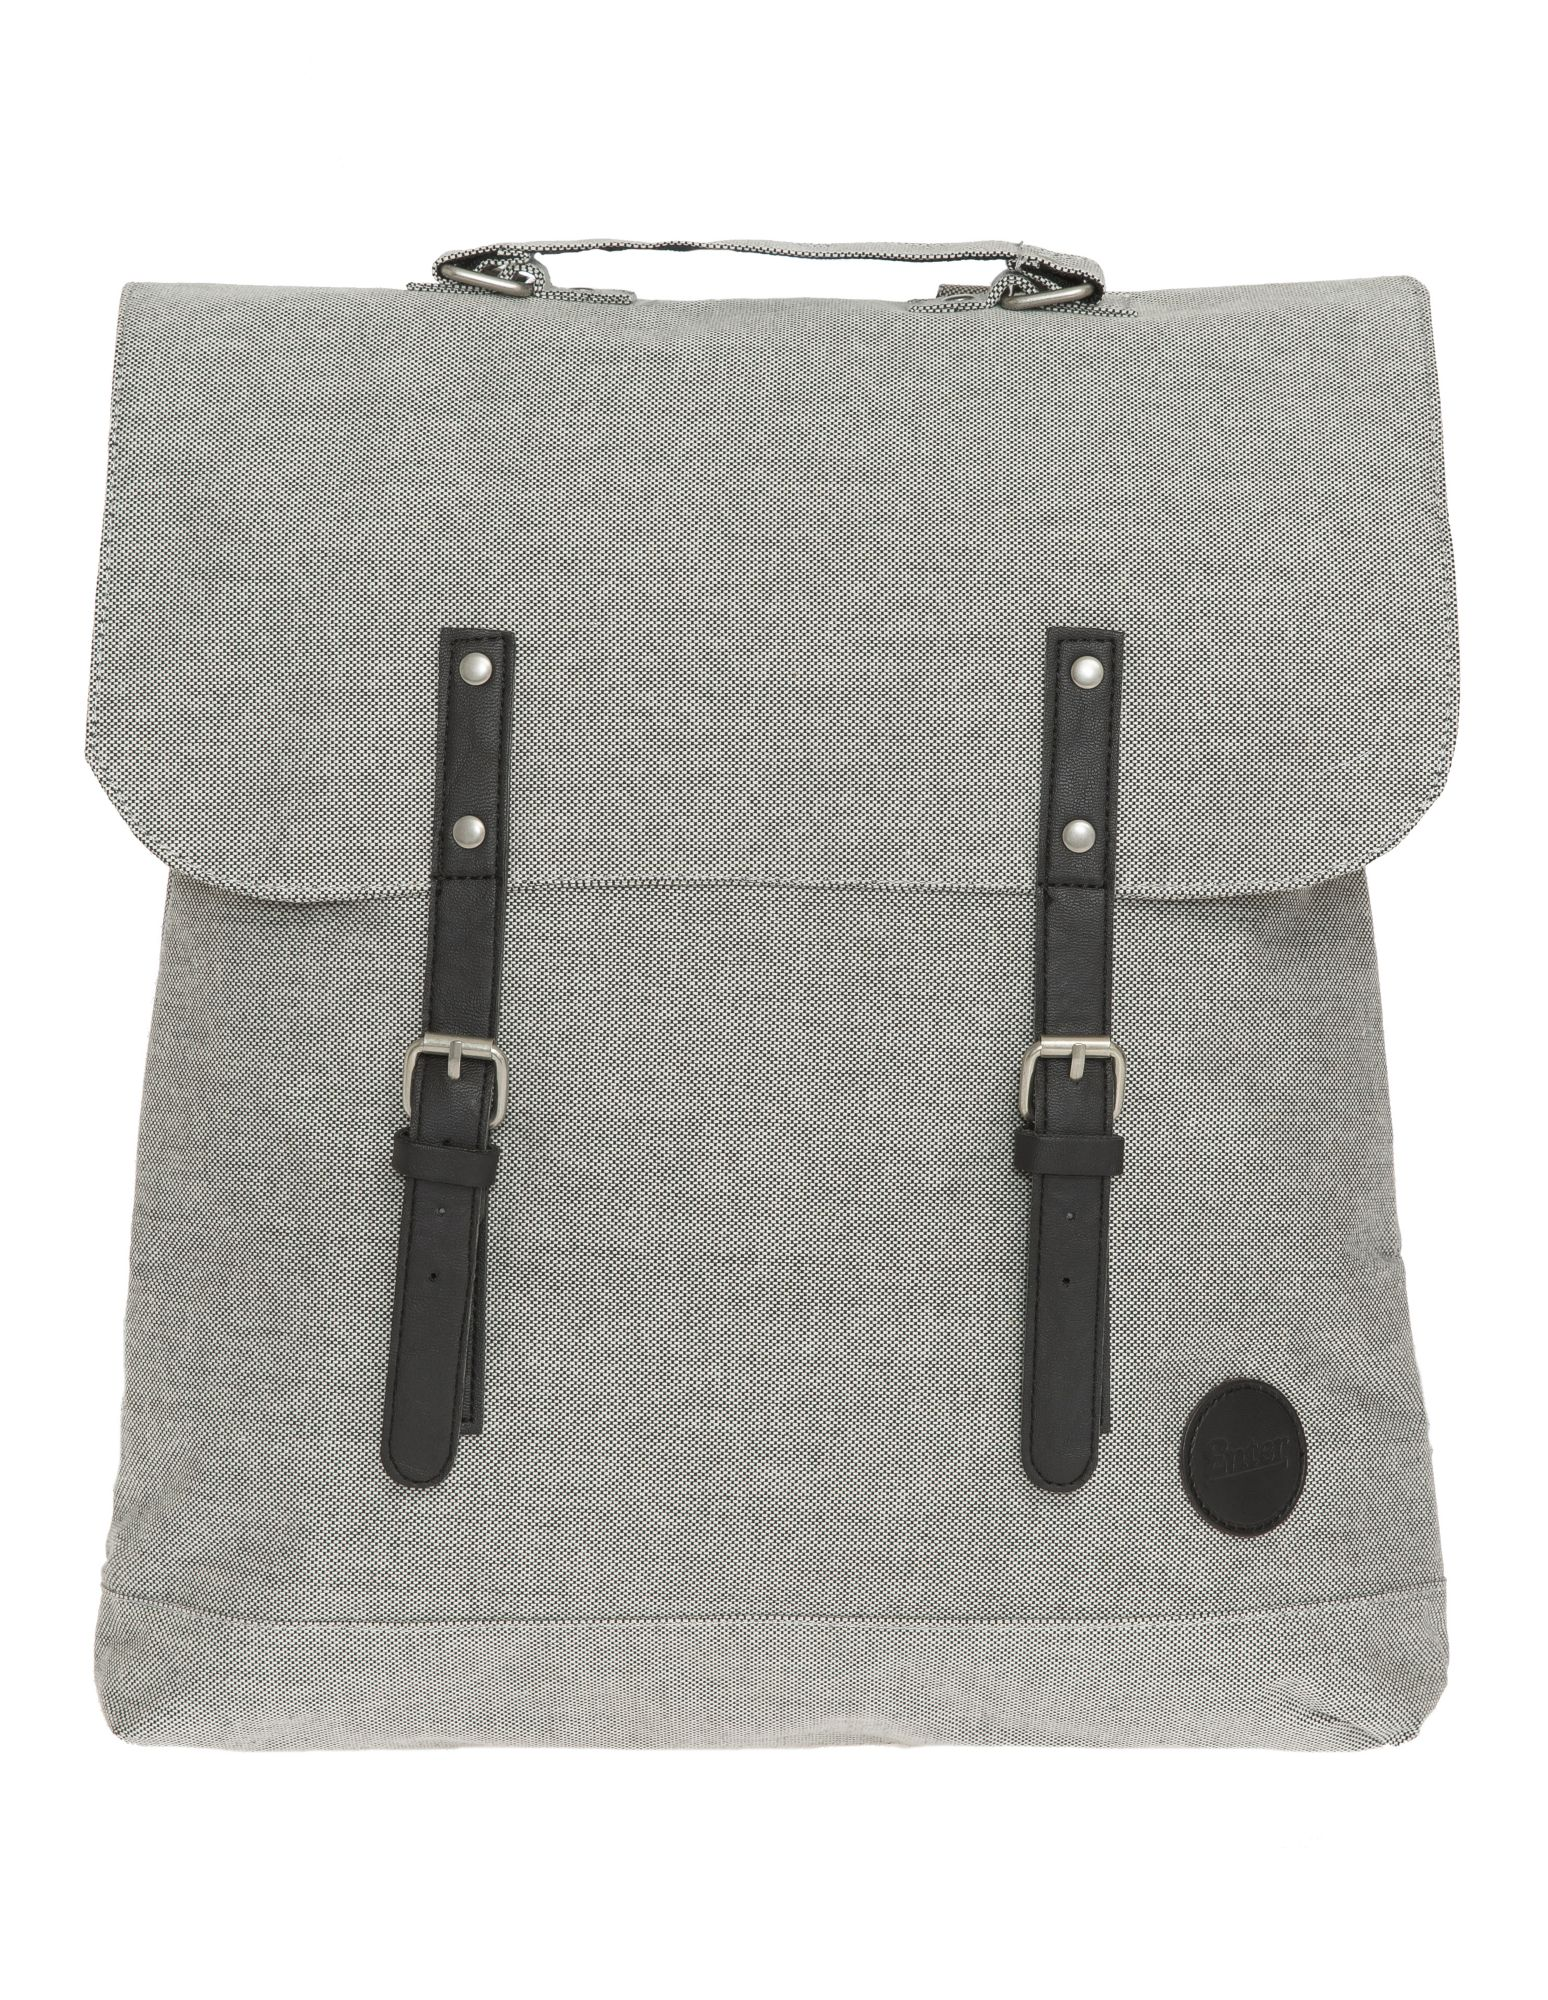 ENTER Enter Rucksack mit 15 Zoll Laptopfach, »Backpack, Melange Black«